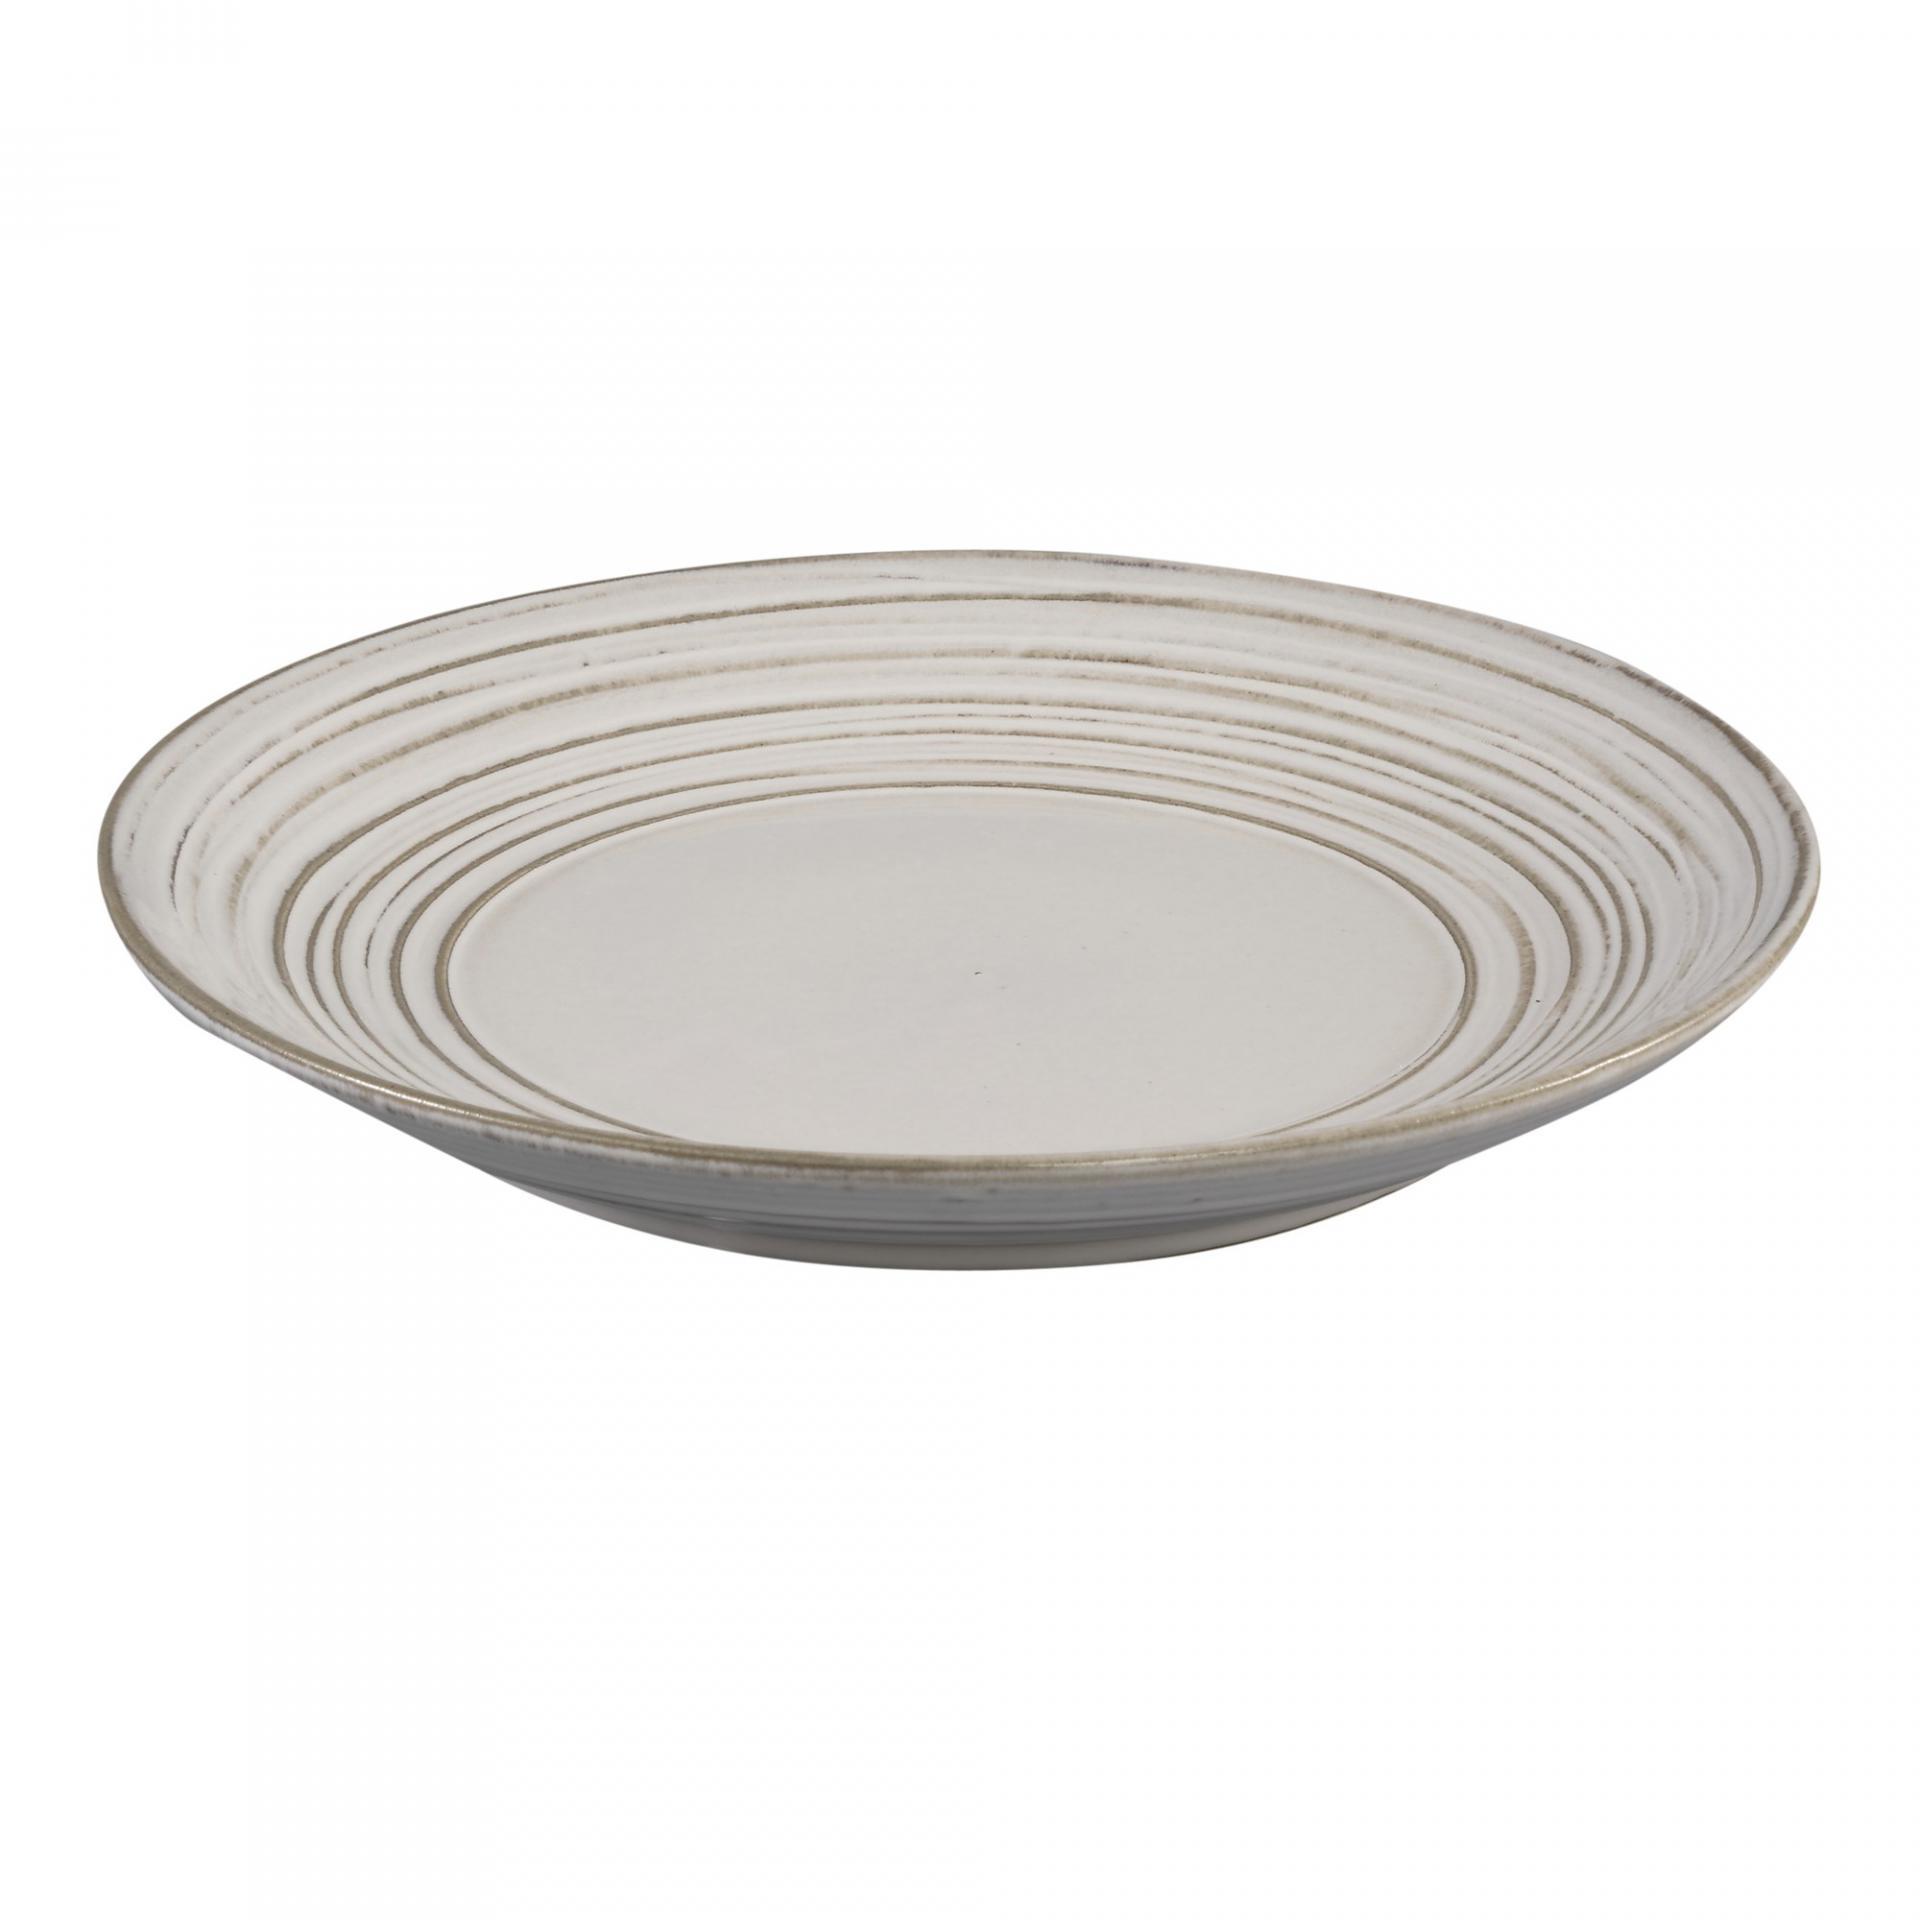 PTMD674595 Sakari ceramic plate L